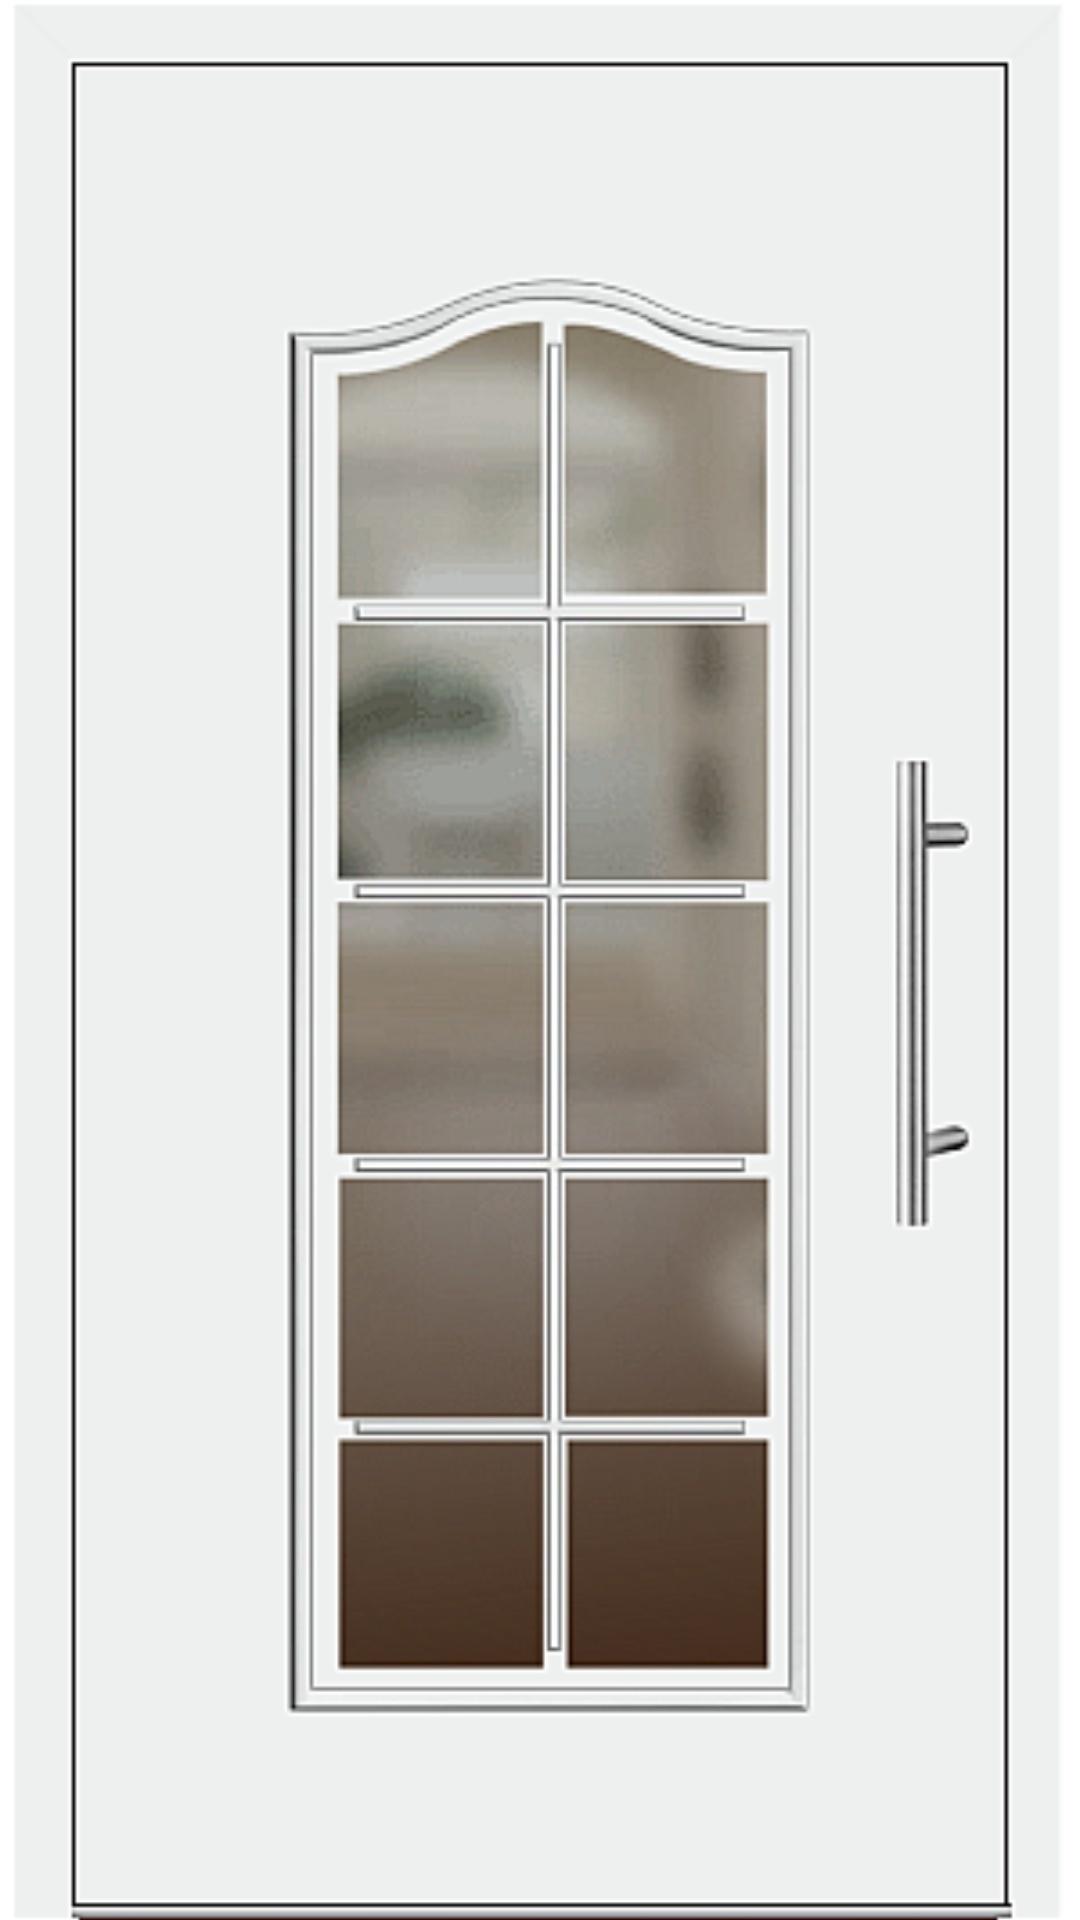 Aluminium Haustür Modell 224-15 weiß